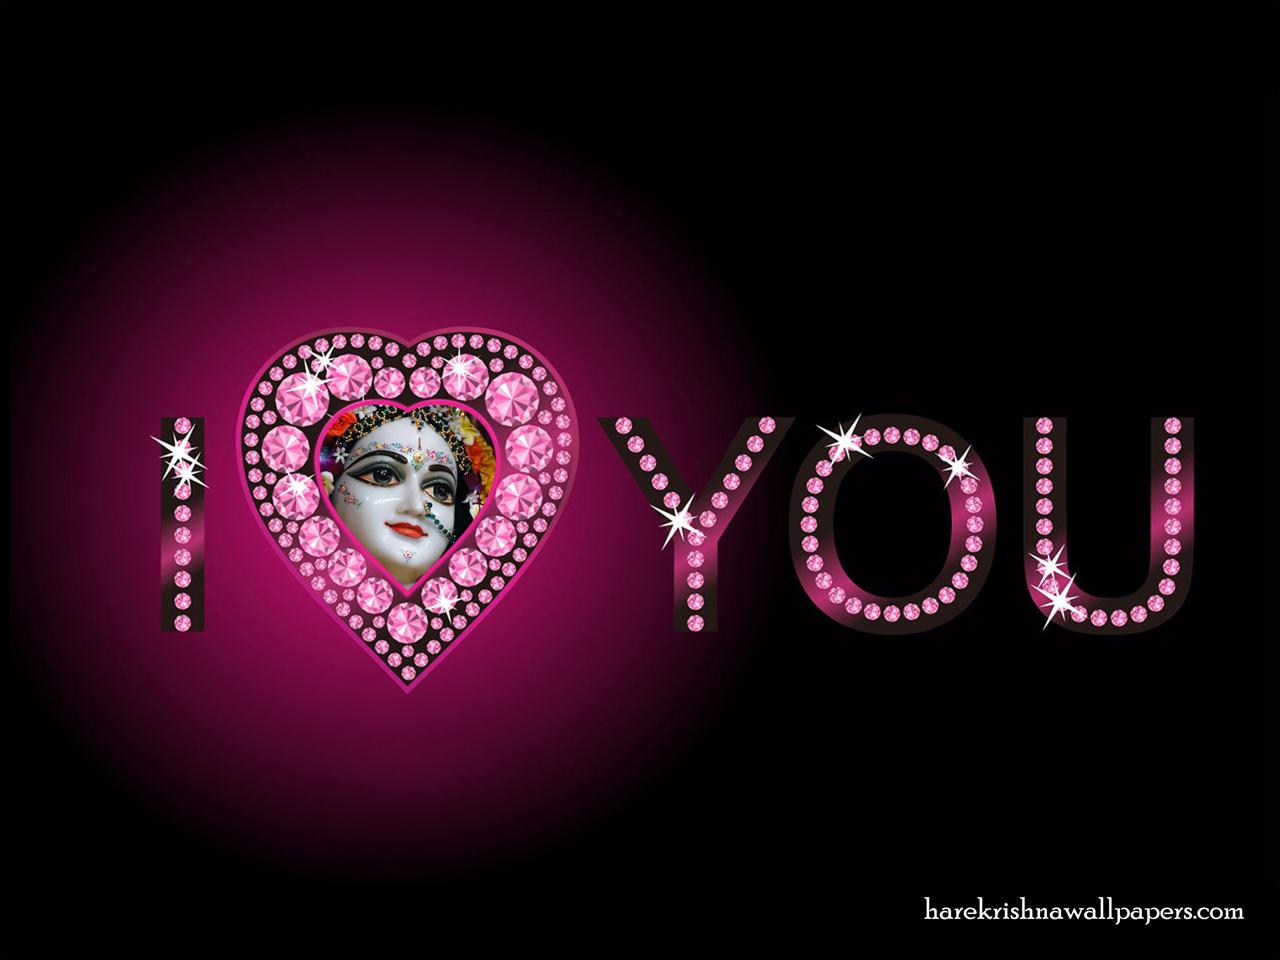 I Love You Radharani Wallpaper (013) Size 1280x960 Download